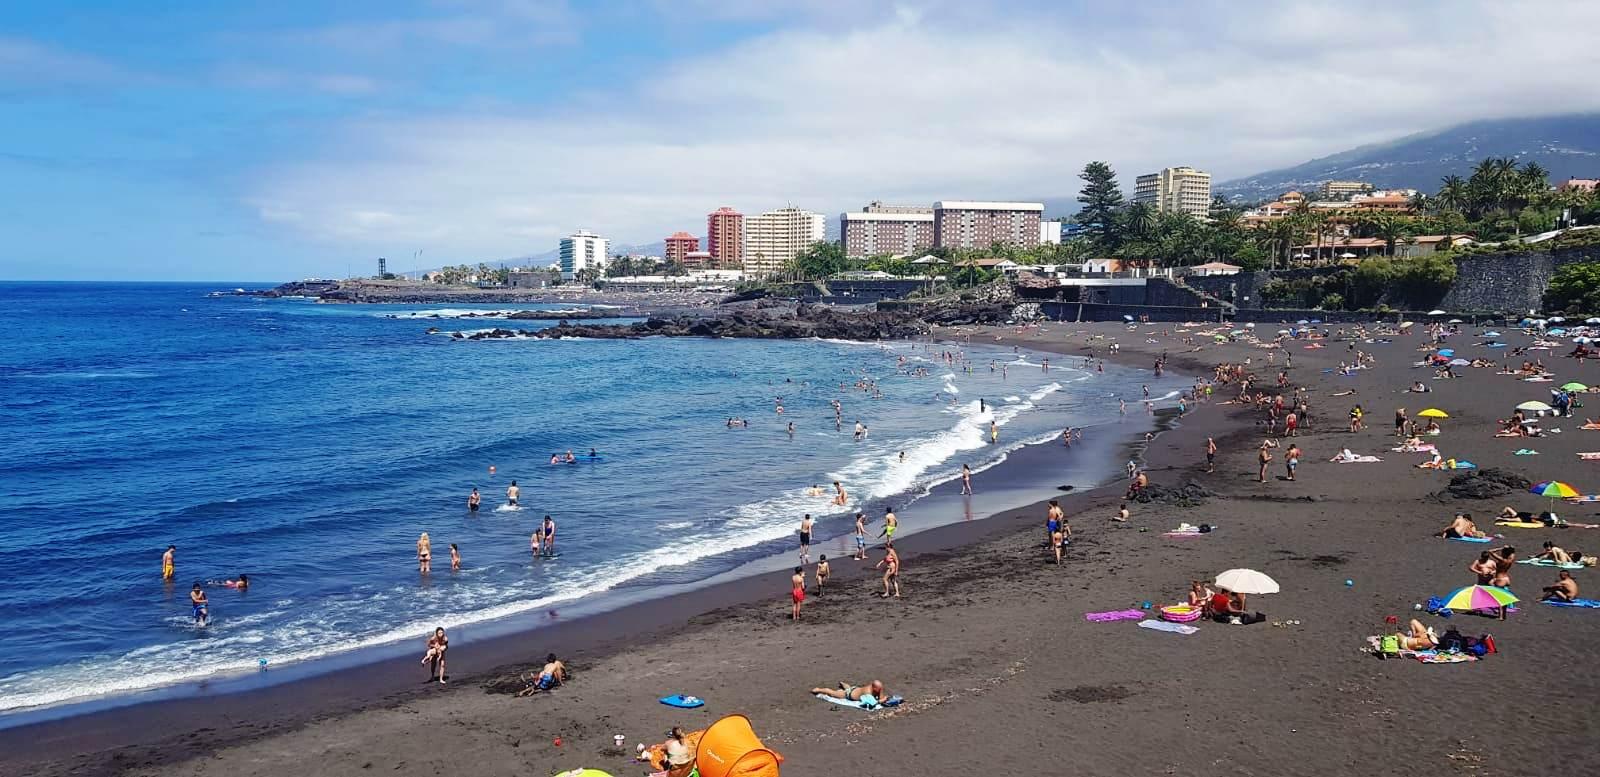 Puerto Santa Cruz, Tenerife - vacantele turistilor - ANCAPAVEL.RO